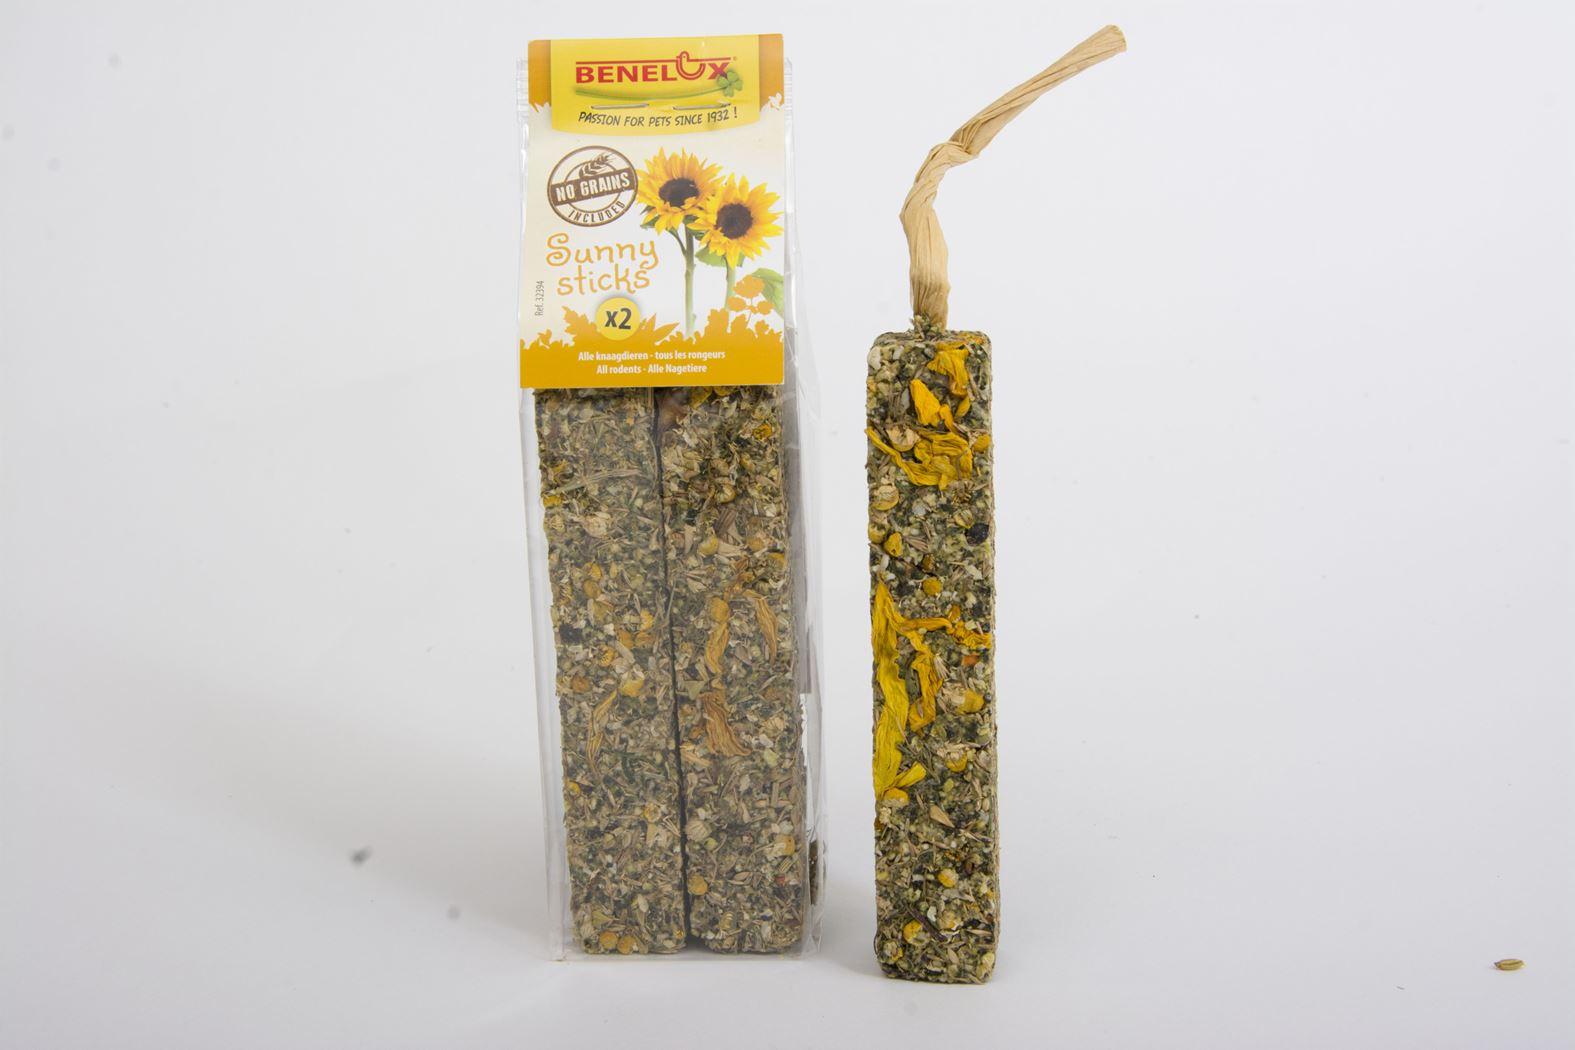 benelux-sticks-sunny-grain-free-2sts